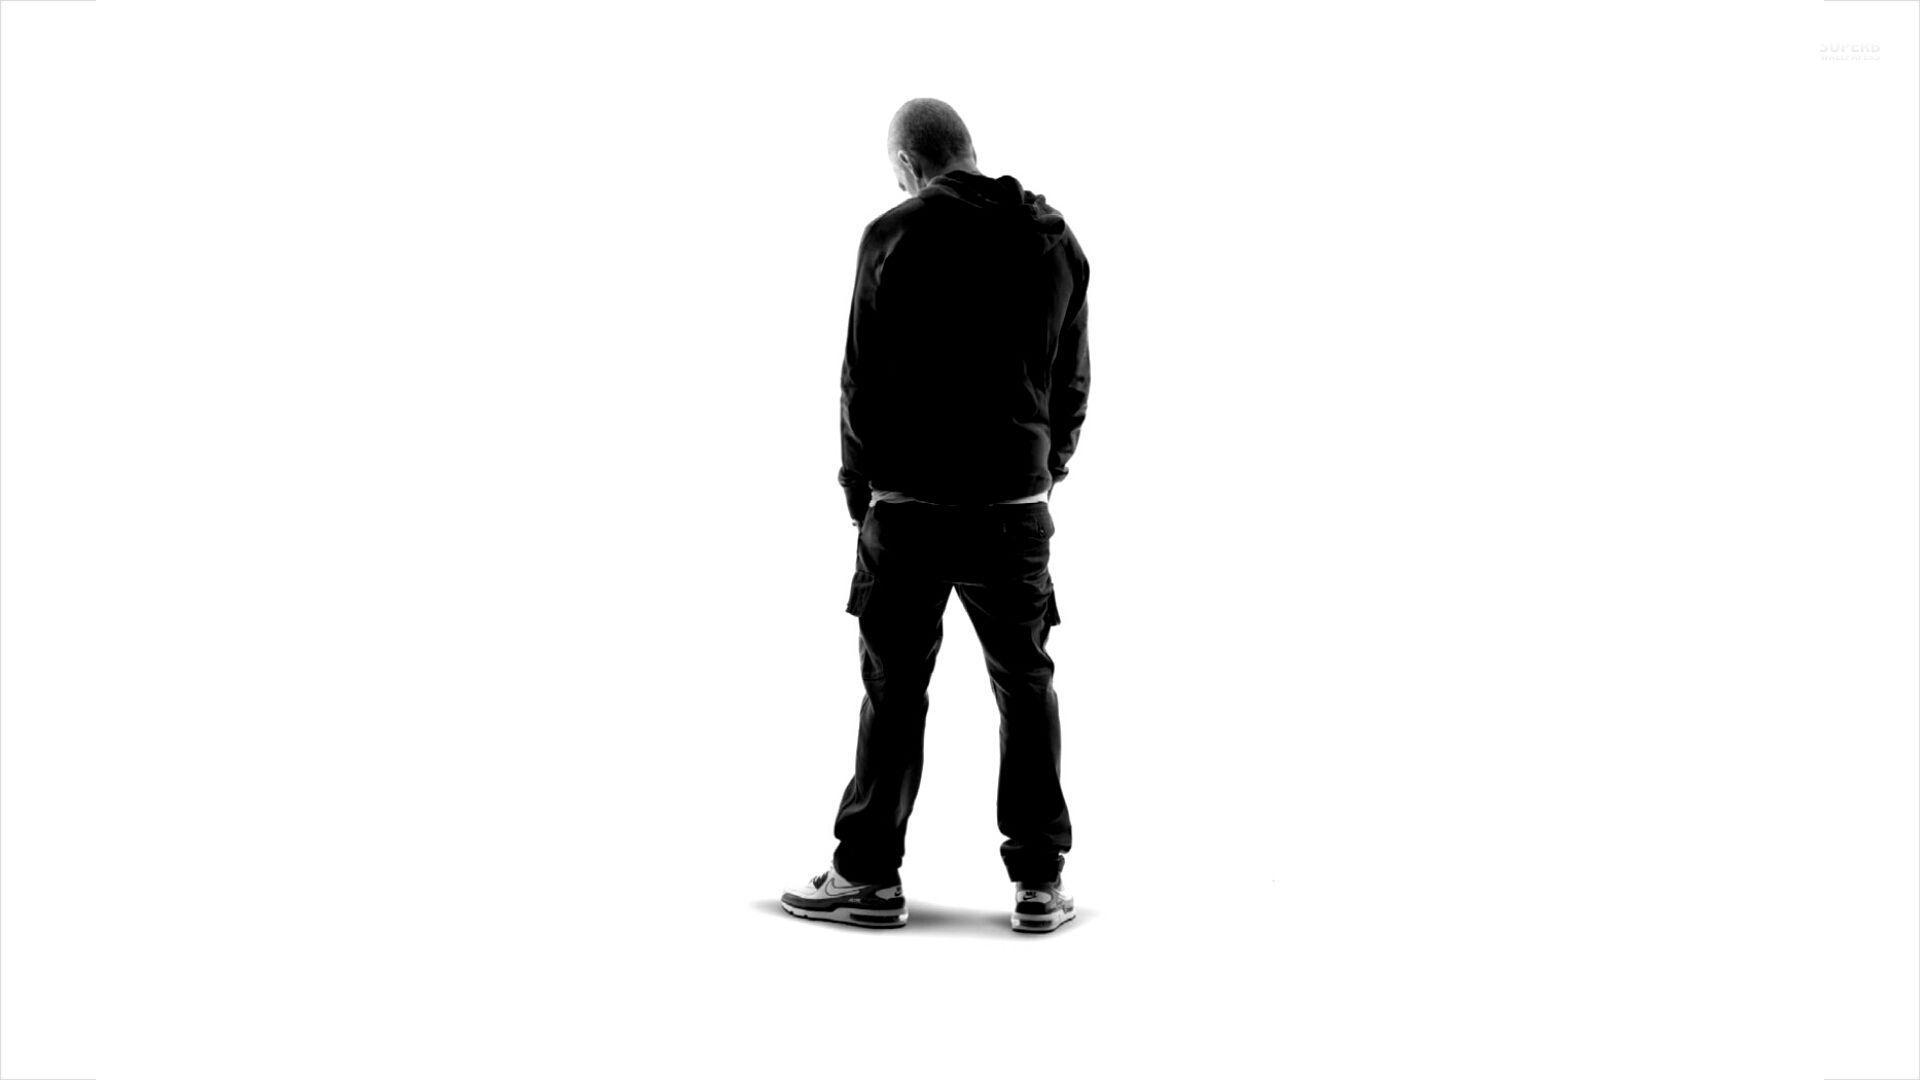 Eminem Wallpaper Eminem Wallpapers Eminem New Eminem